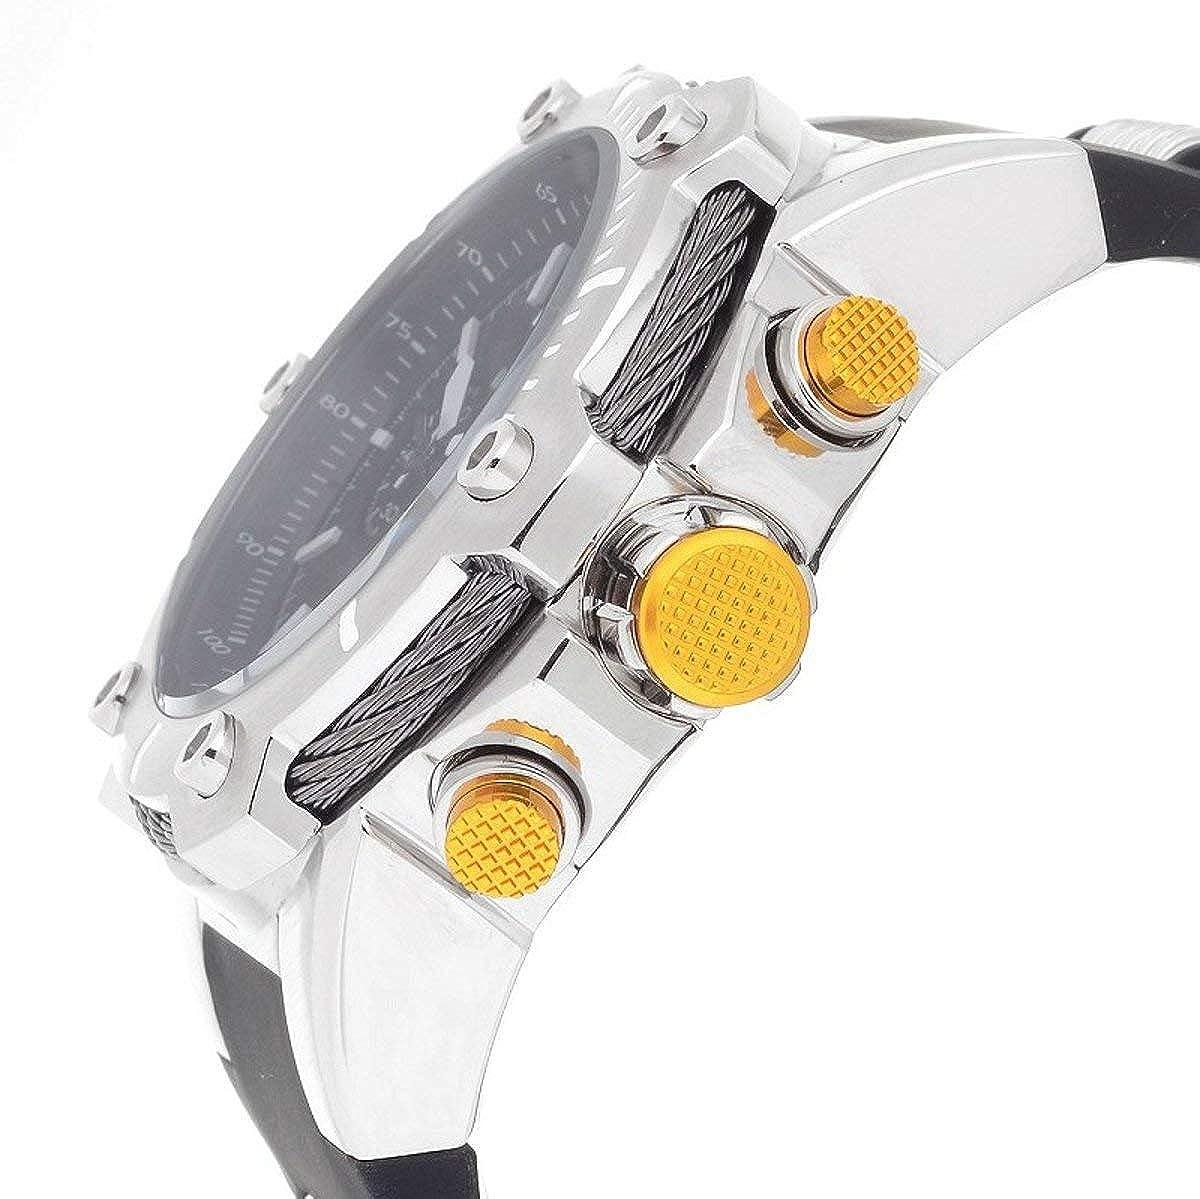 Amazon.com: Invicta Mens Bolt Stainless Steel Quartz Watch with Polyurethane Strap, Black, 30 (Model: 25472: Watches